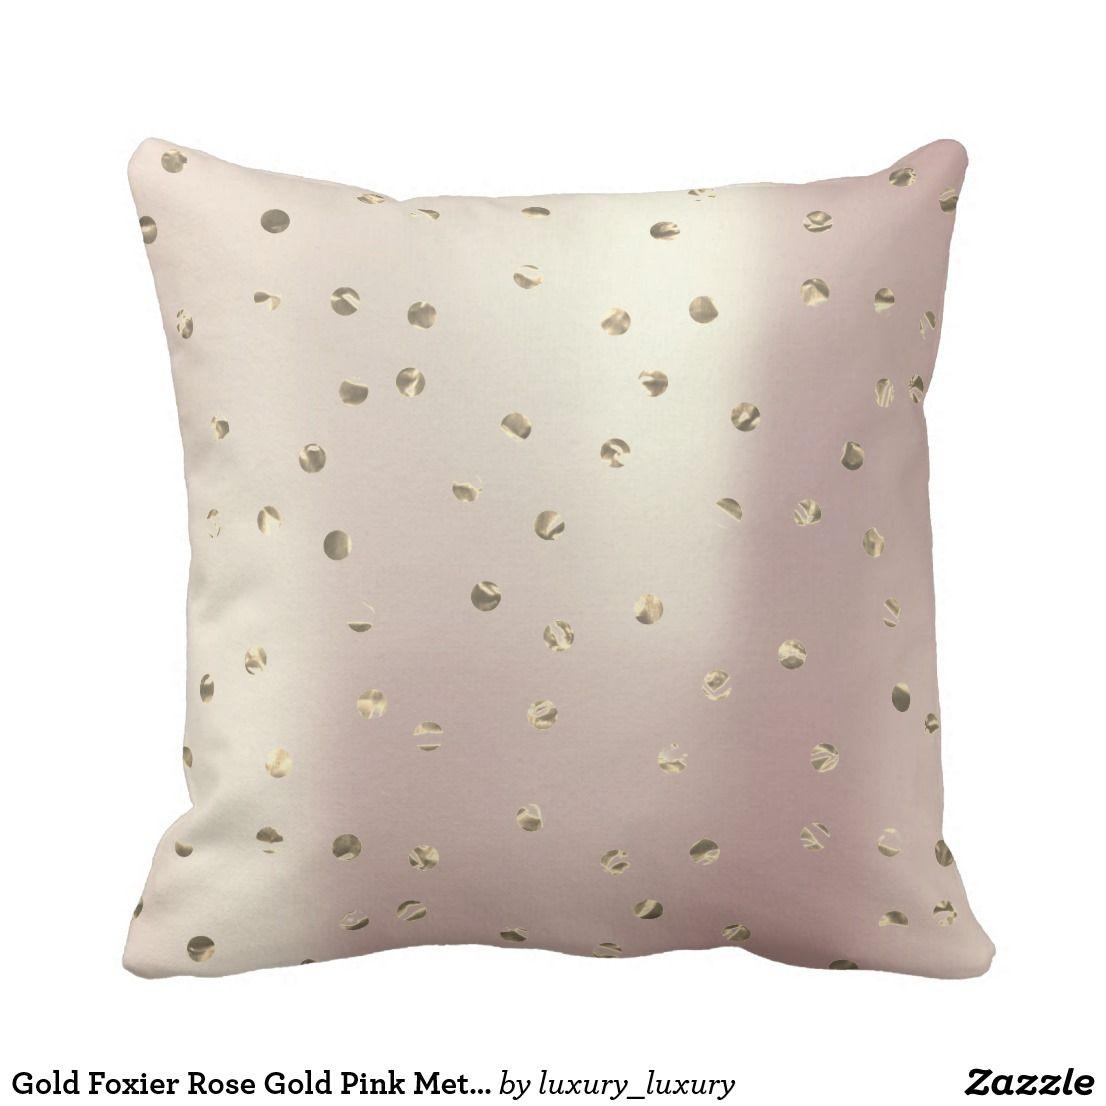 Gold Foxier Rose Gold Pink Metallic Polka Dots